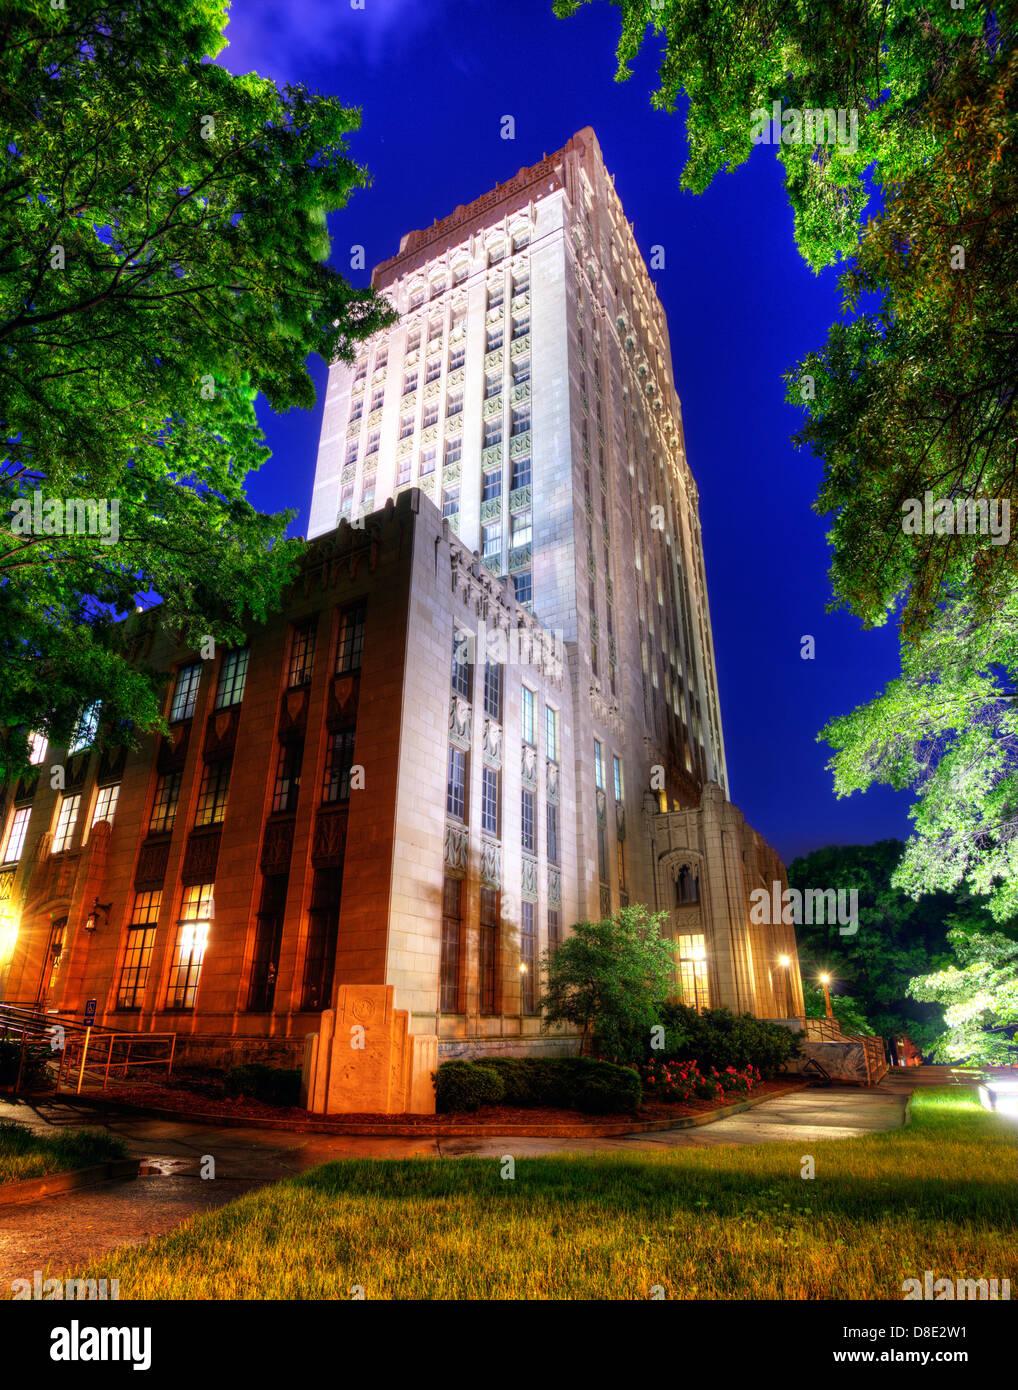 City Hall in Atlanta, Georgia, USA. - Stock Image